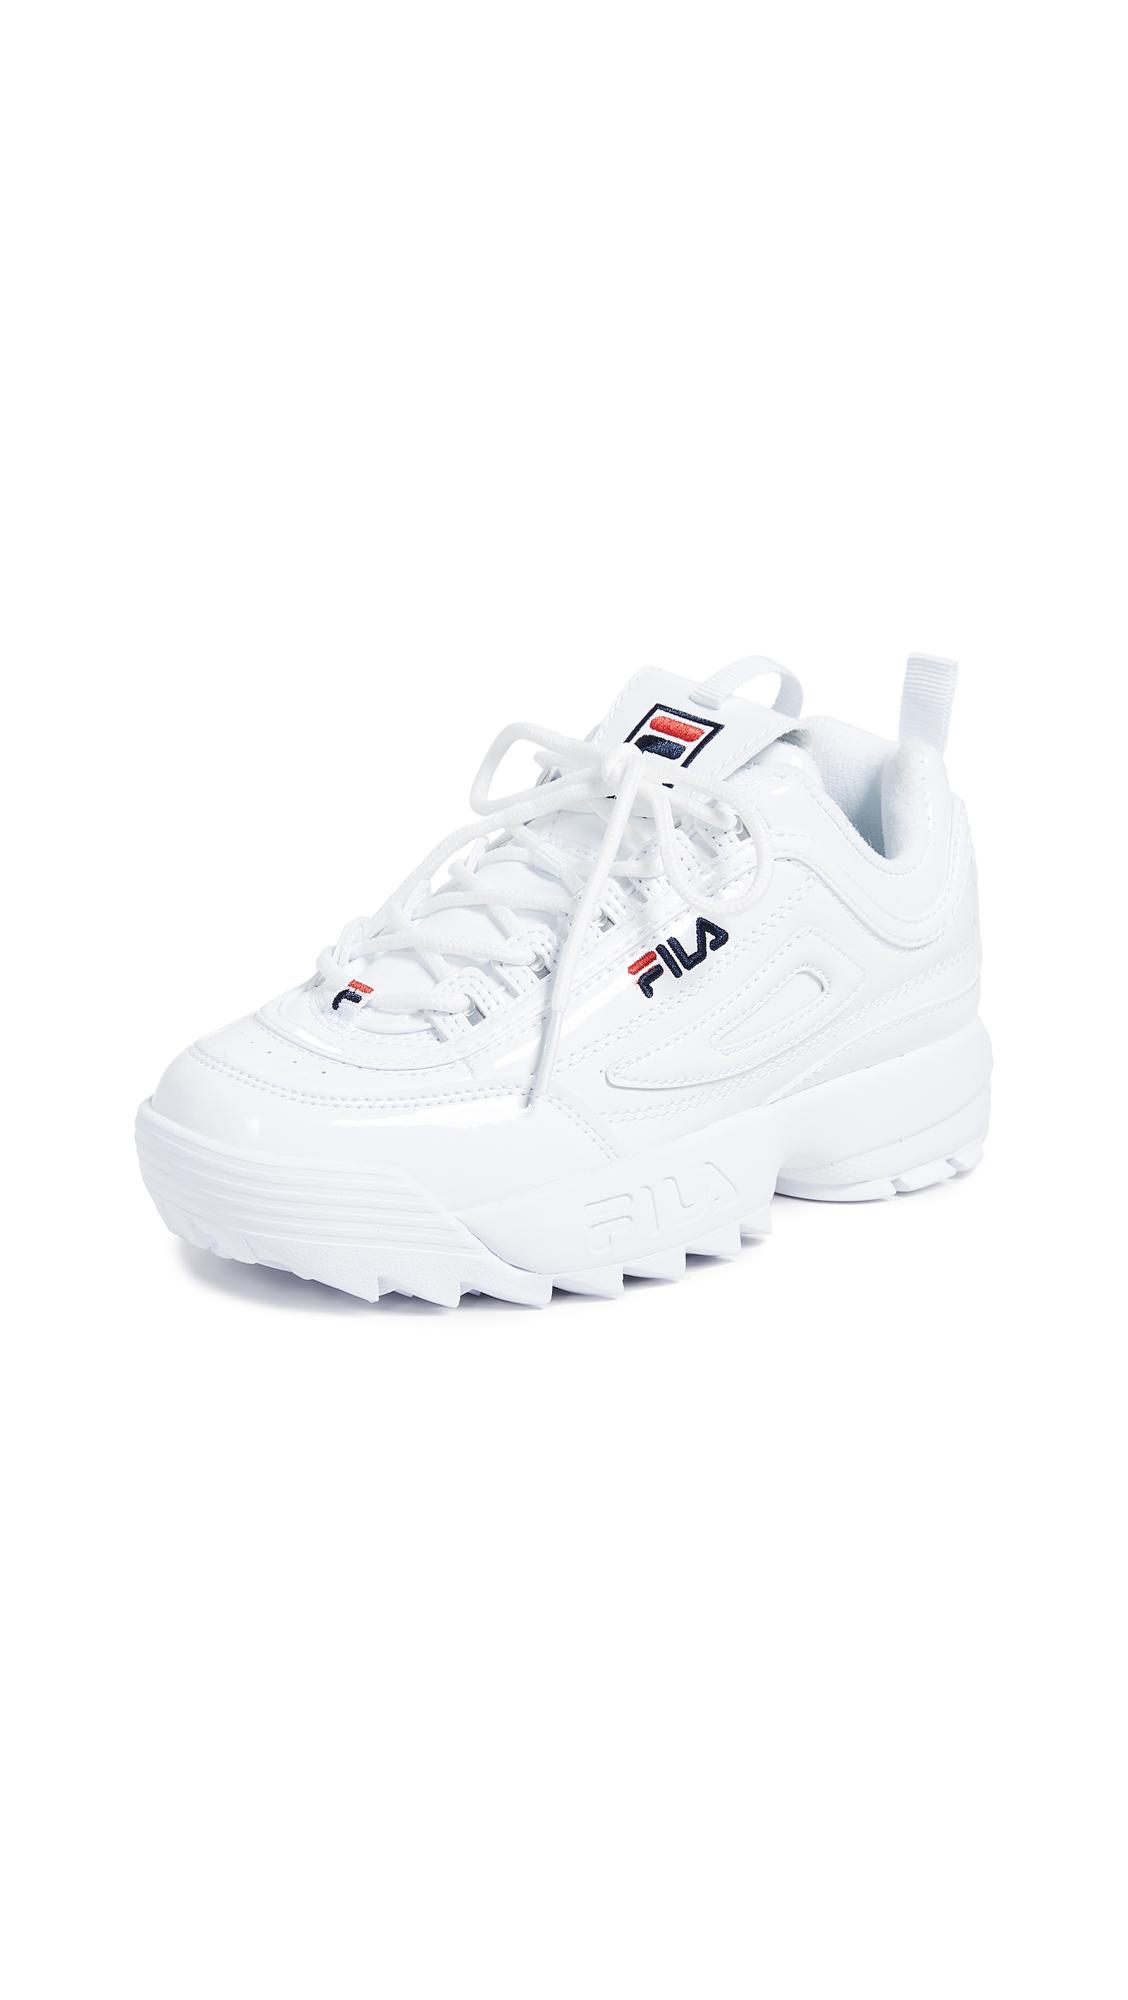 Fila Disruptor II Premium Patent Sneakers - White/Fila Navy/Fila Red